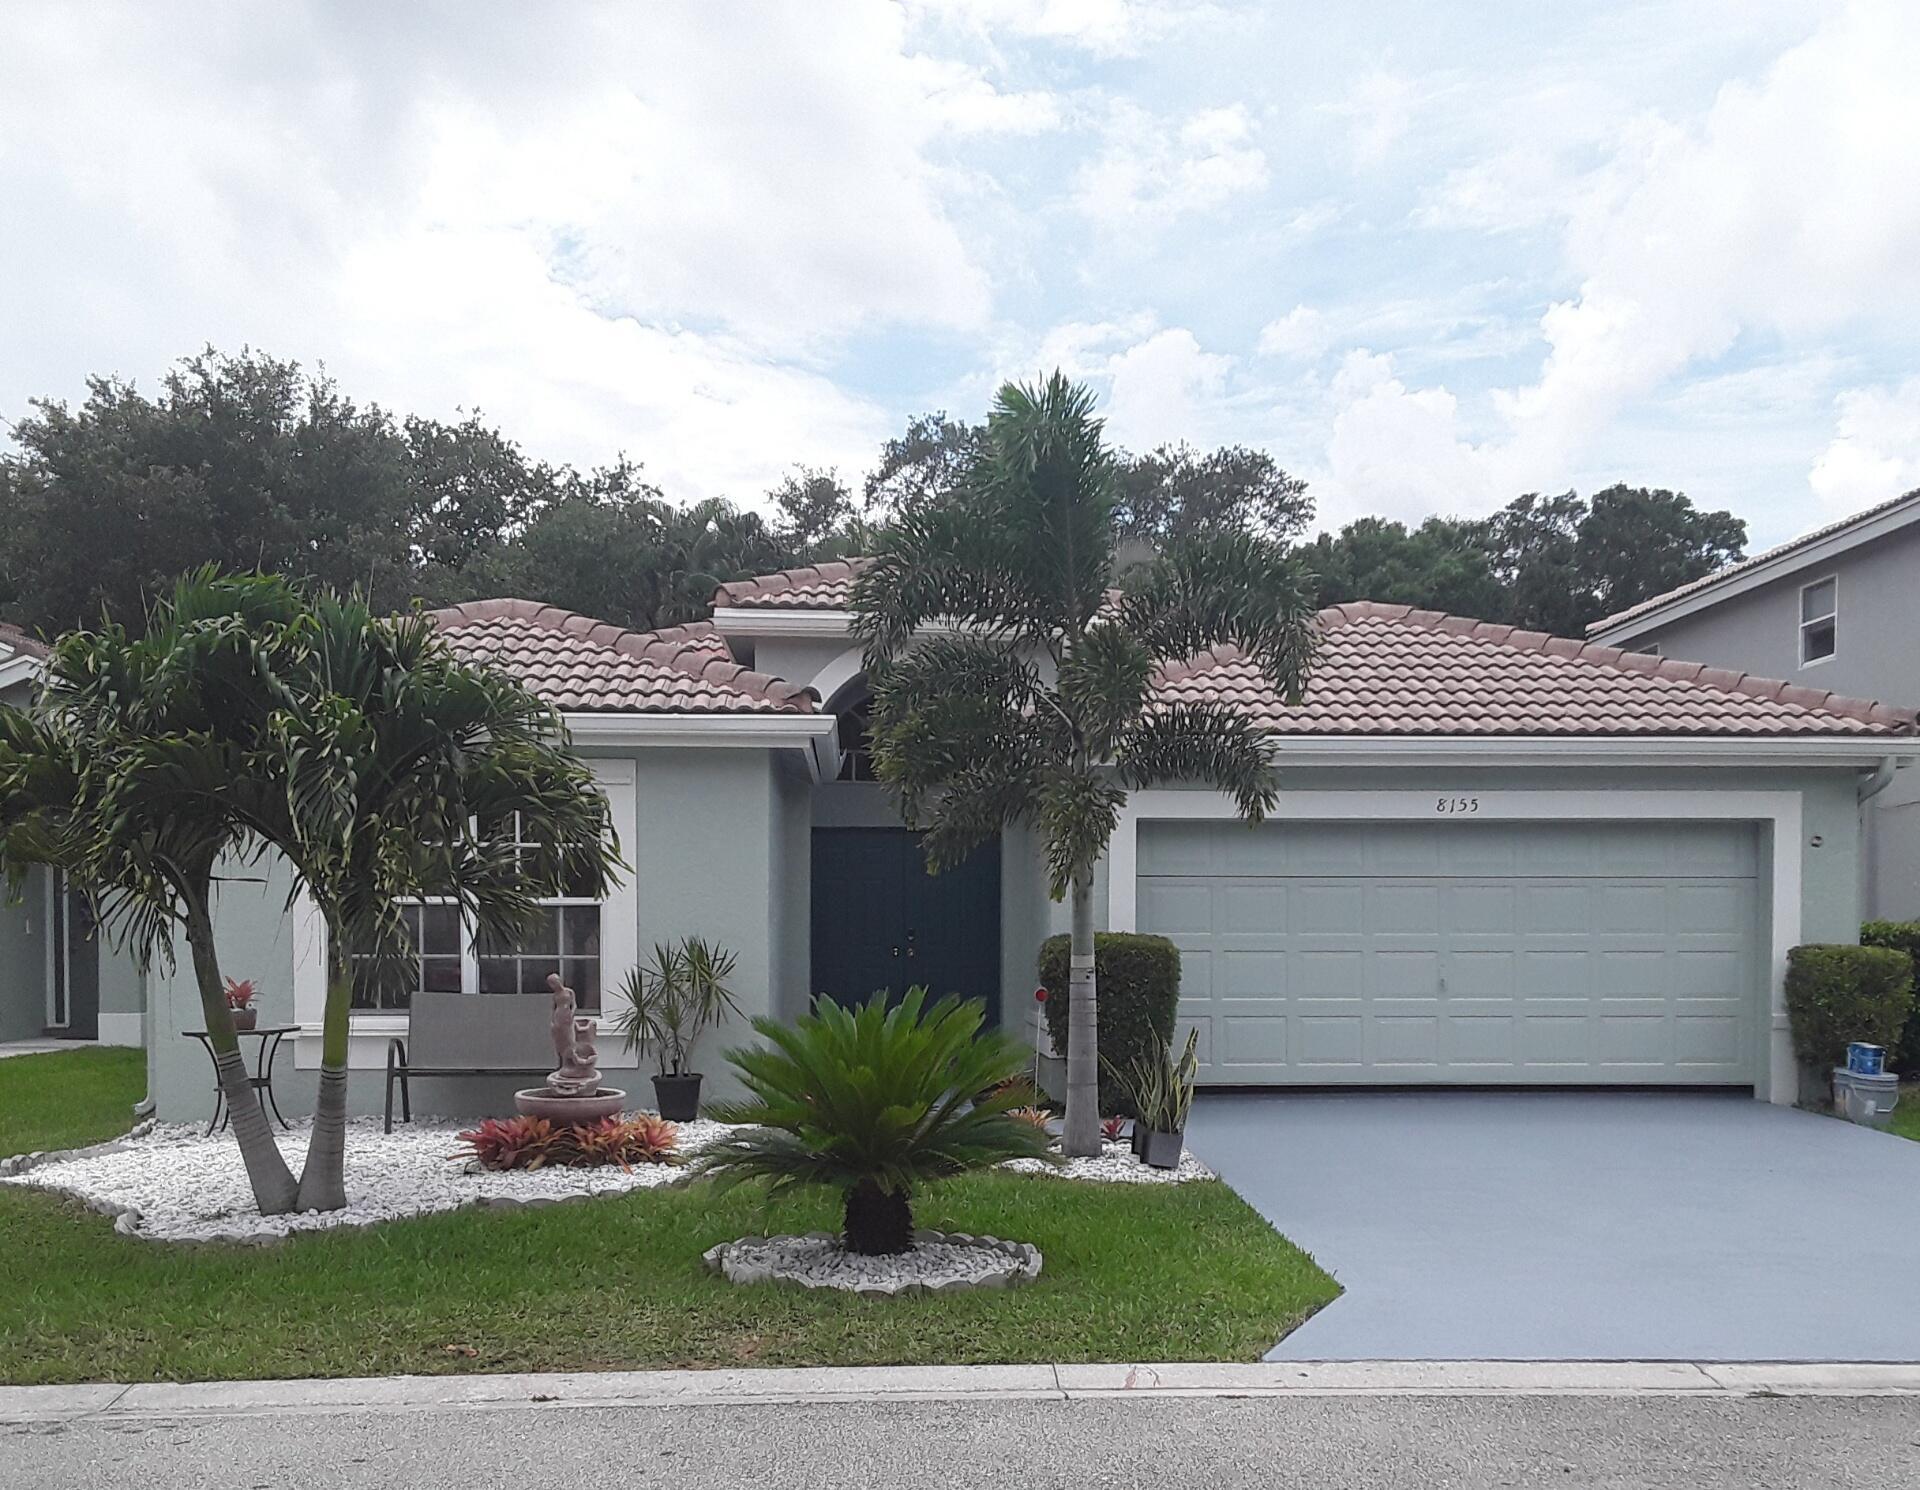 8155 Mystic Harbor Circle Circle Boynton Beach, FL 33436